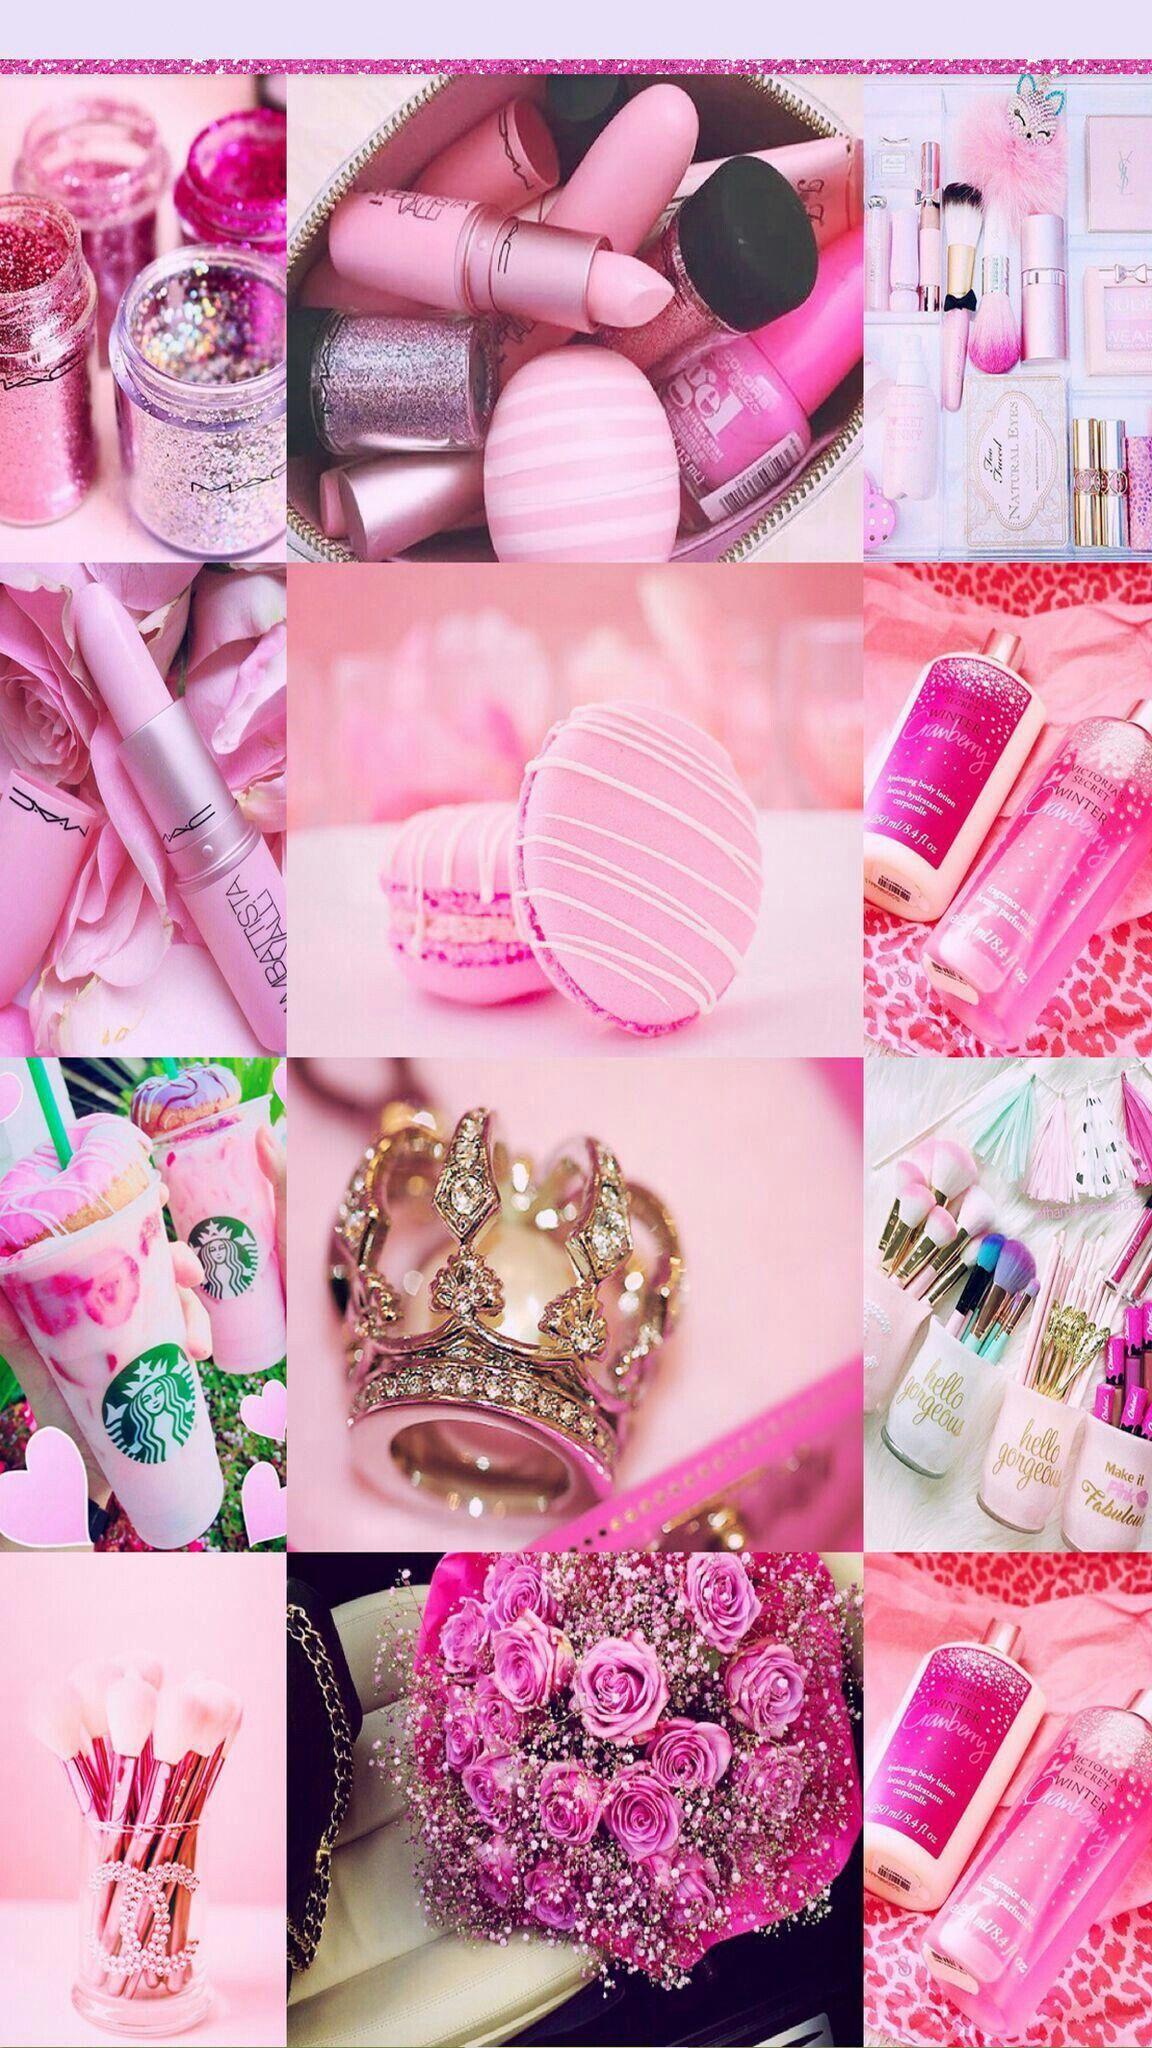 #Pinklips | Pink lips, Pink aesthetic, Pink life